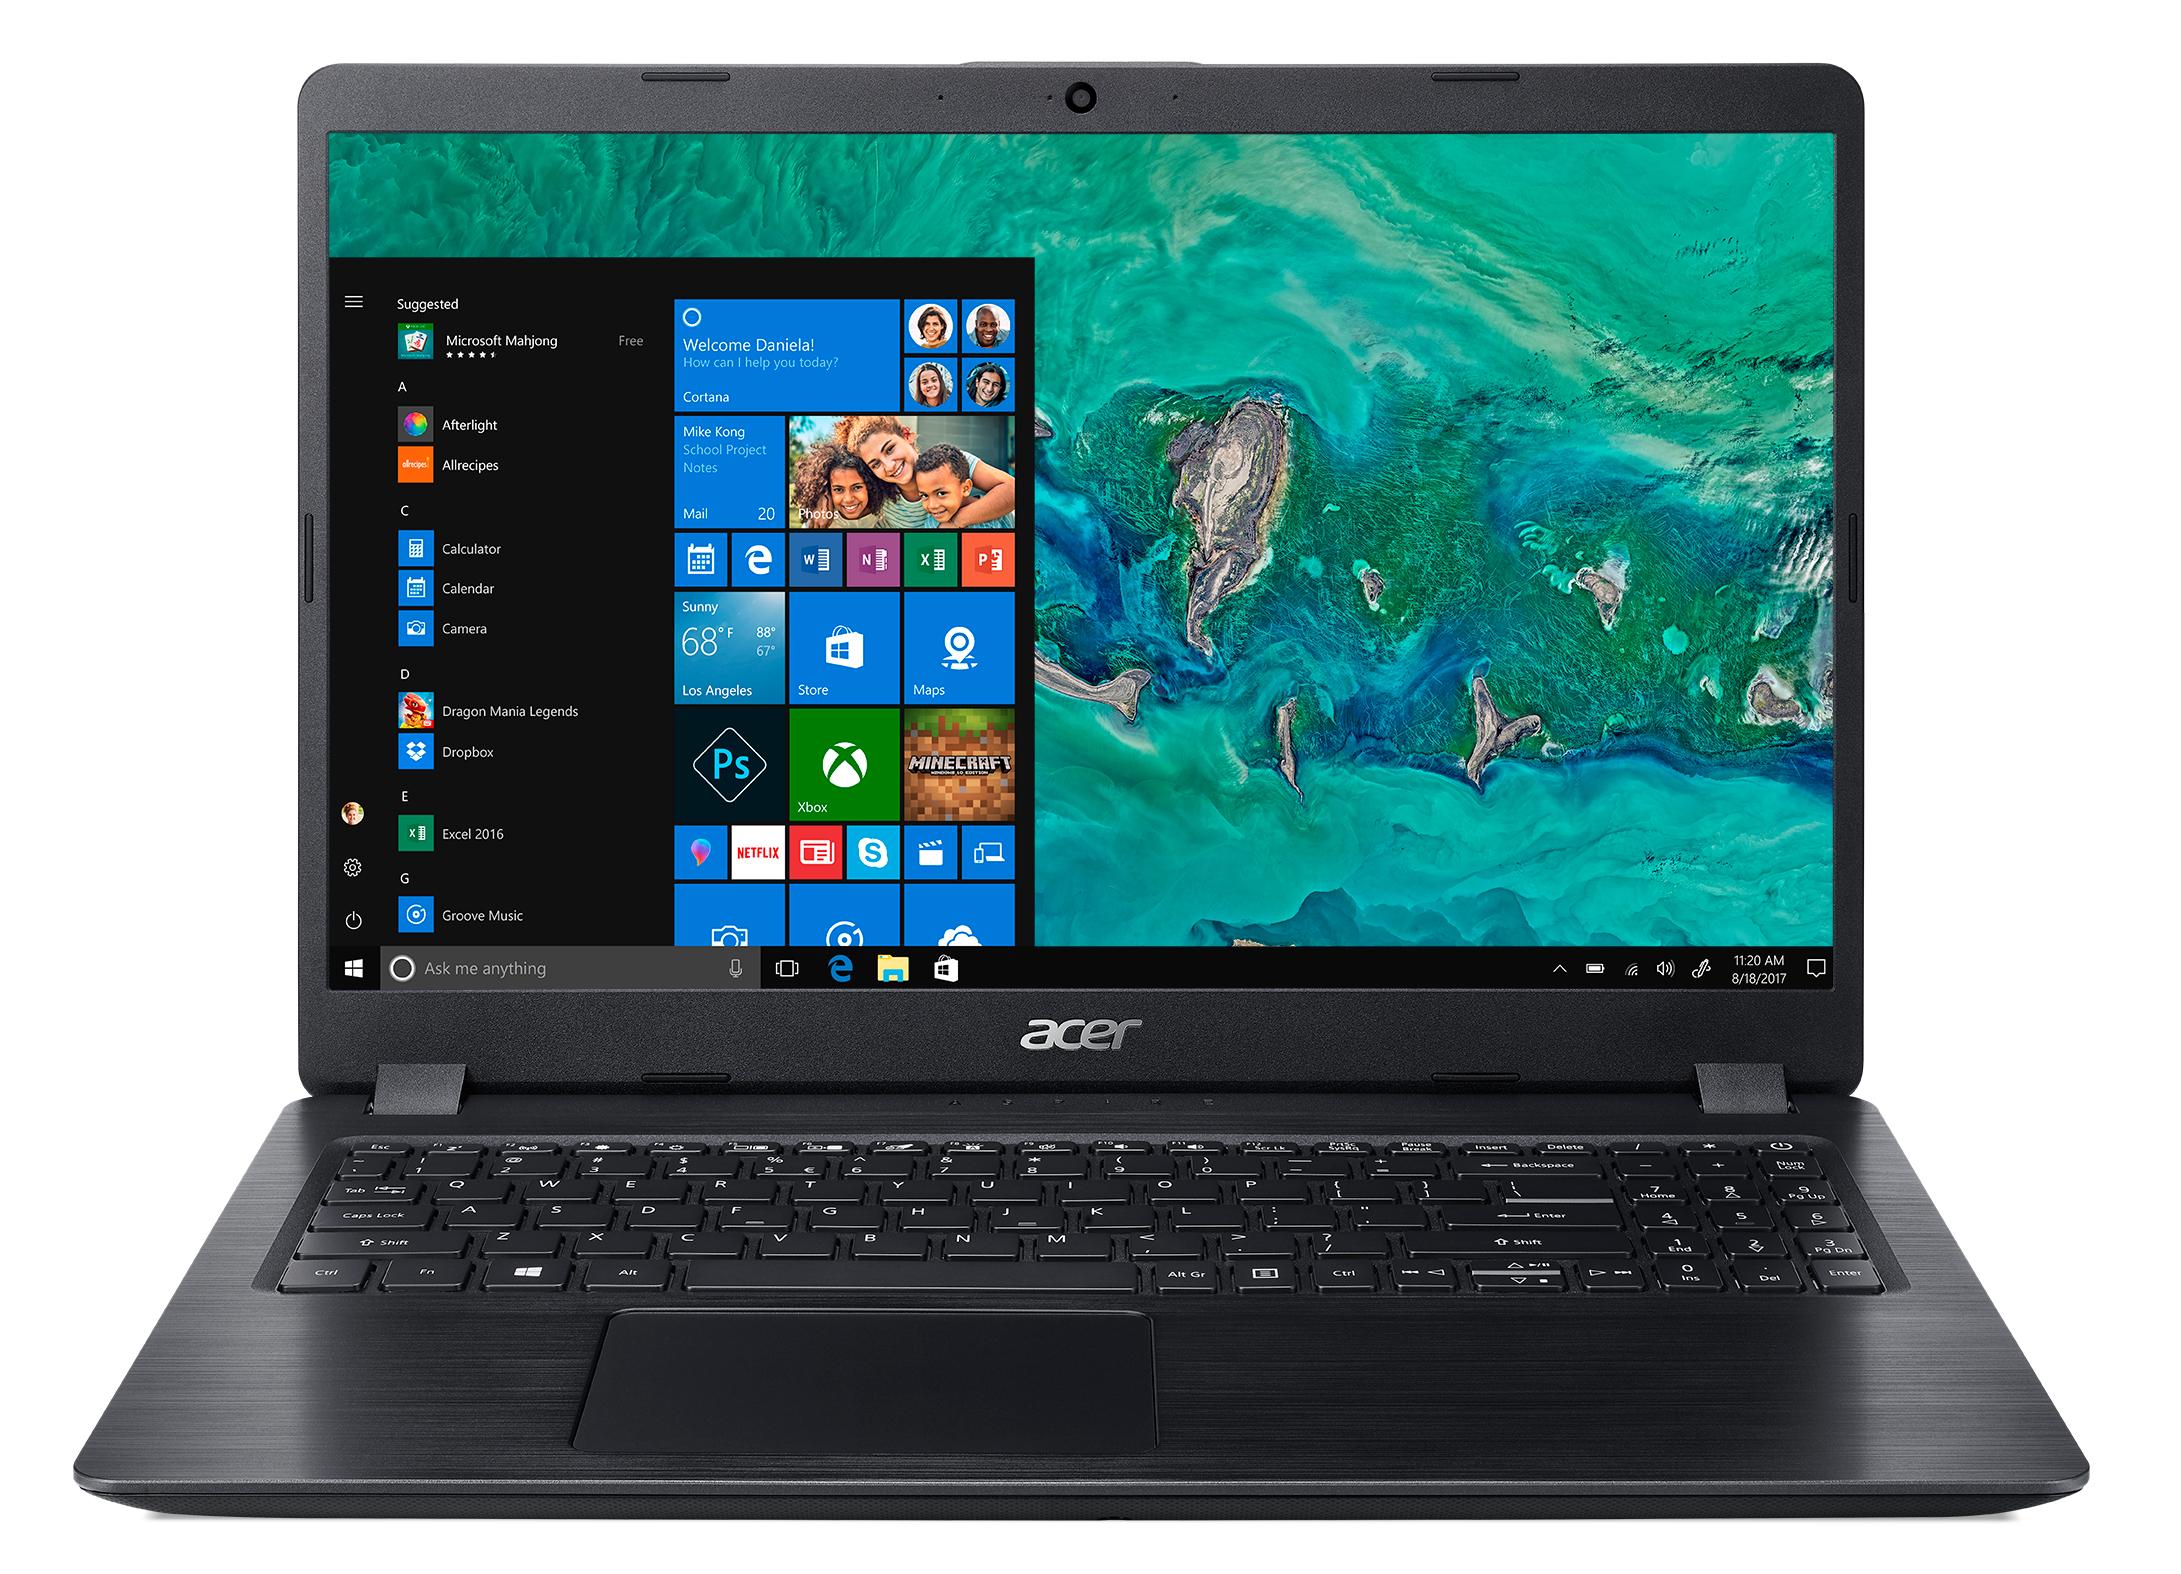 Acer Aspire 5 A515-52G-52S2 15.6 FHD-Intel core i5-8265U - 8GB - 265GB SSD + 1TB HDD - GeForce MX130 Win10home